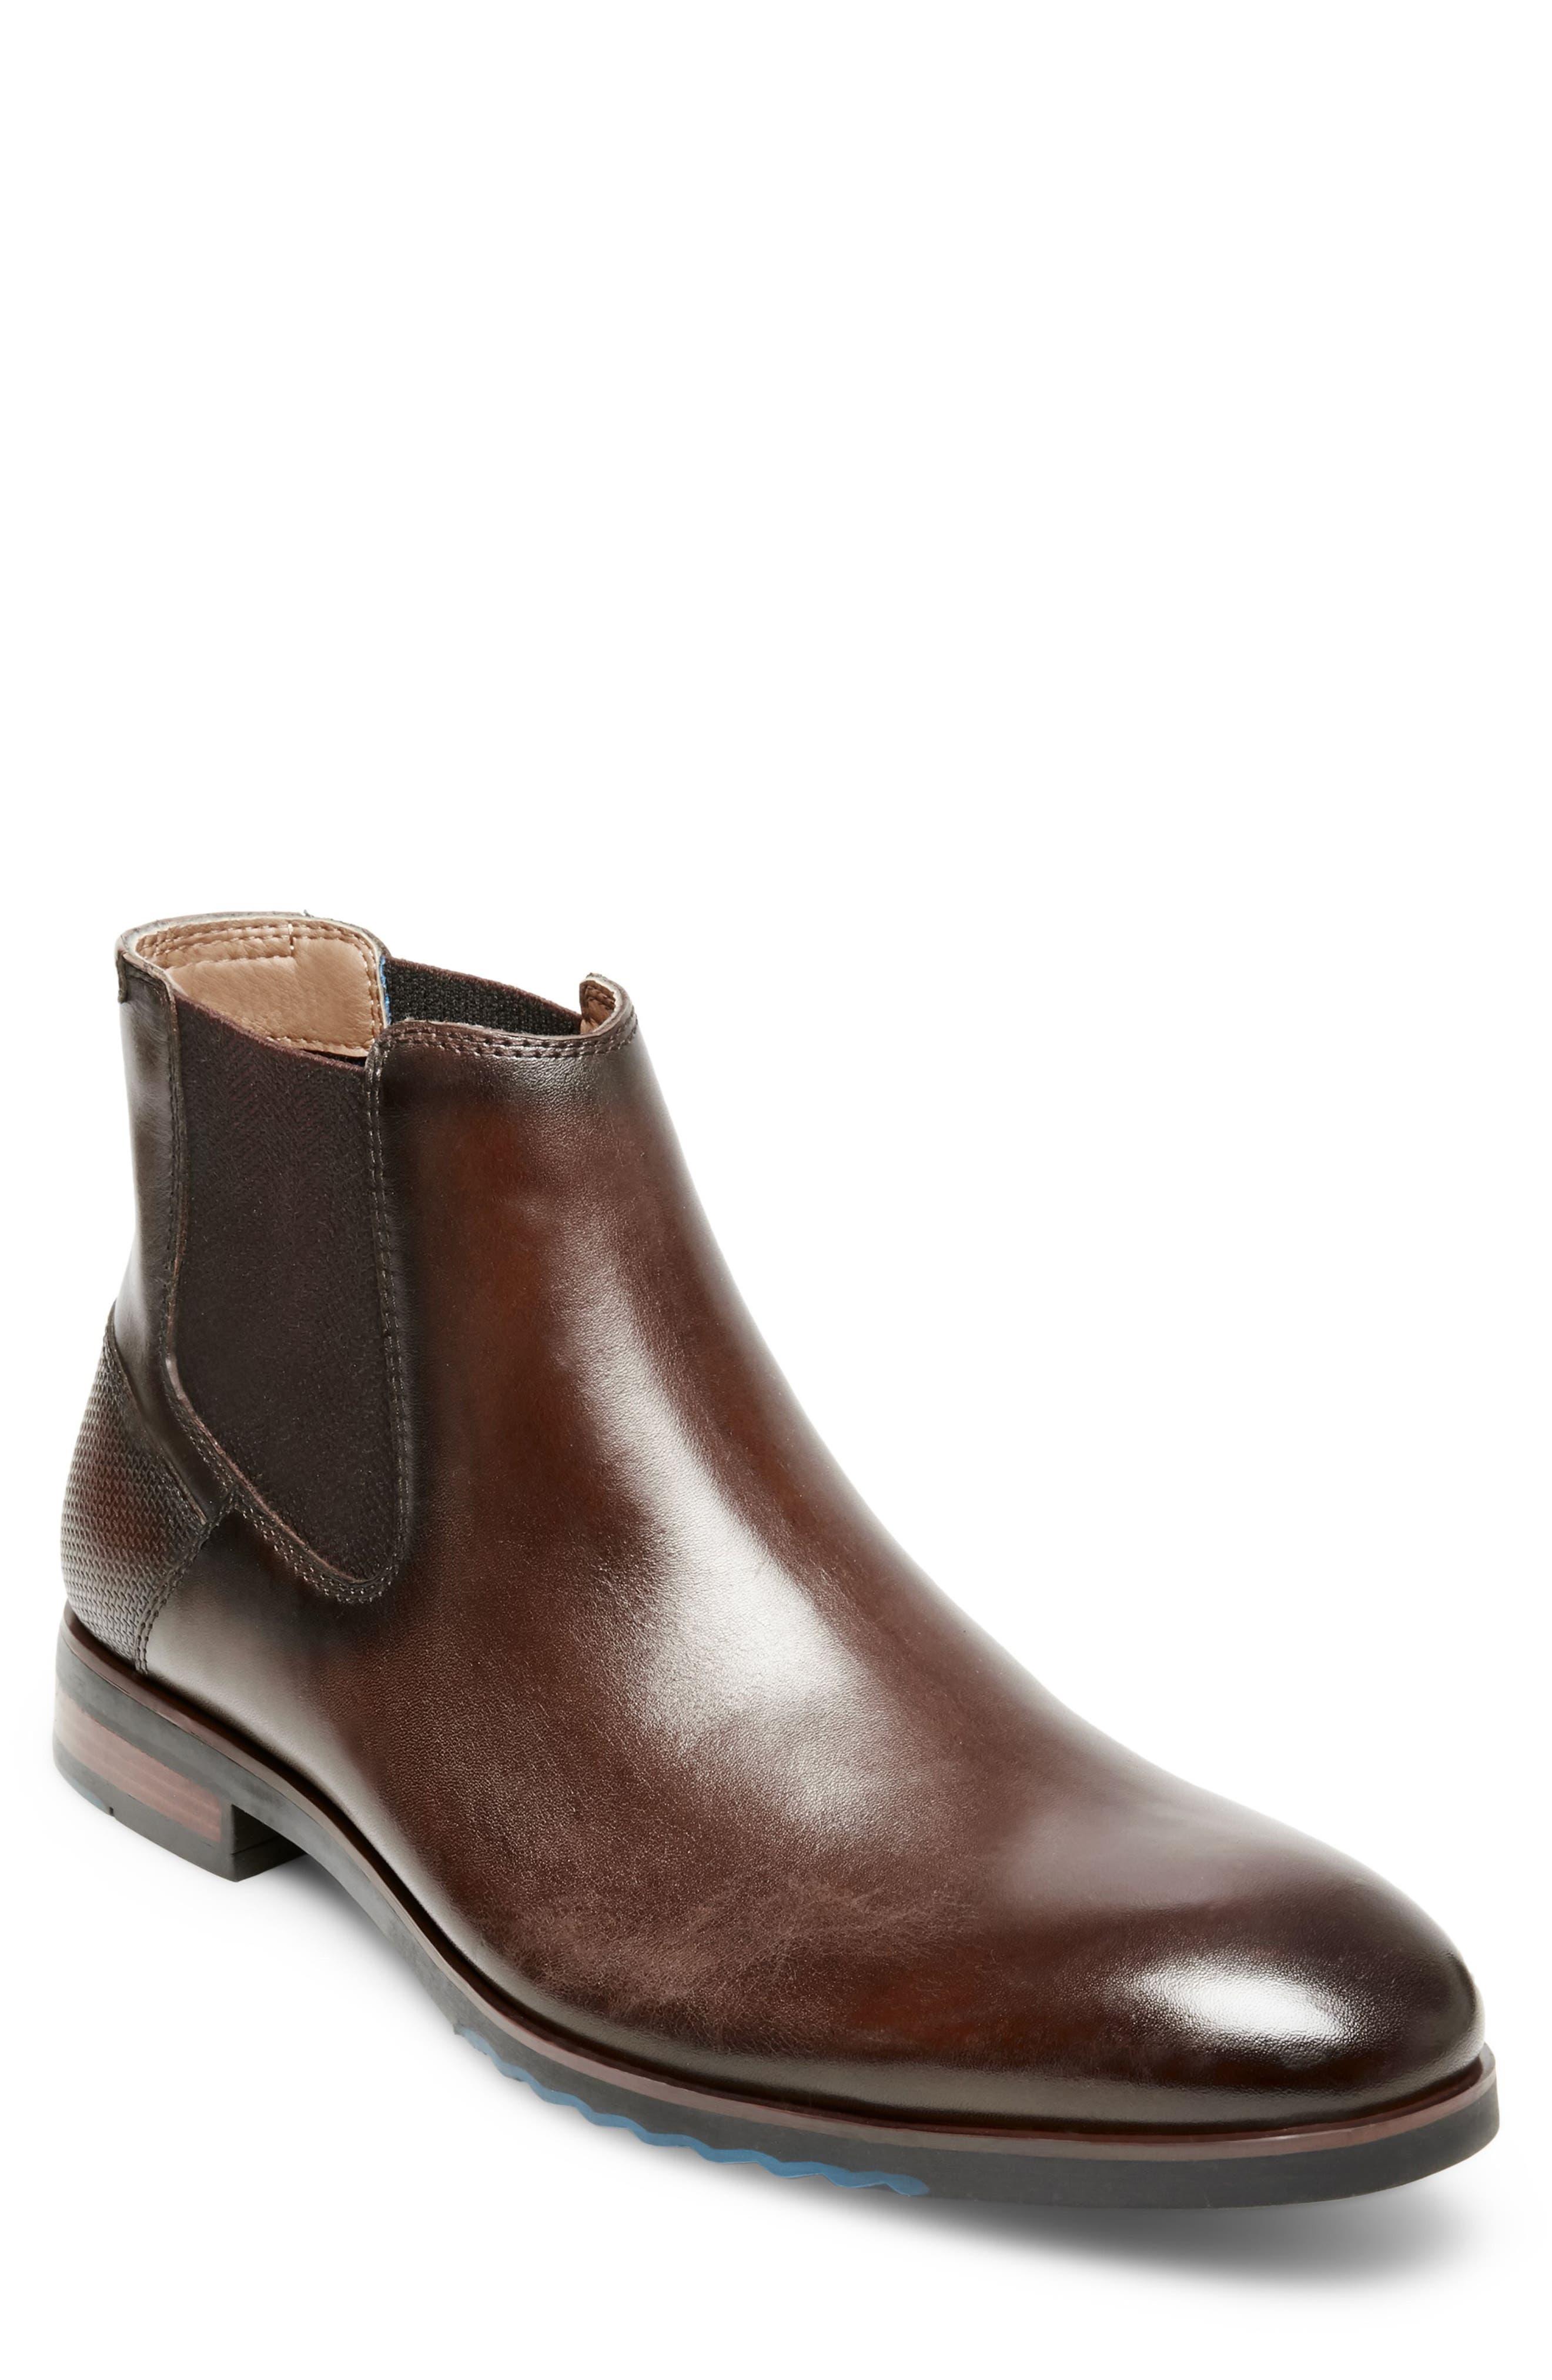 Leston Chelsea Boot,                             Main thumbnail 1, color,                             Brown Leather